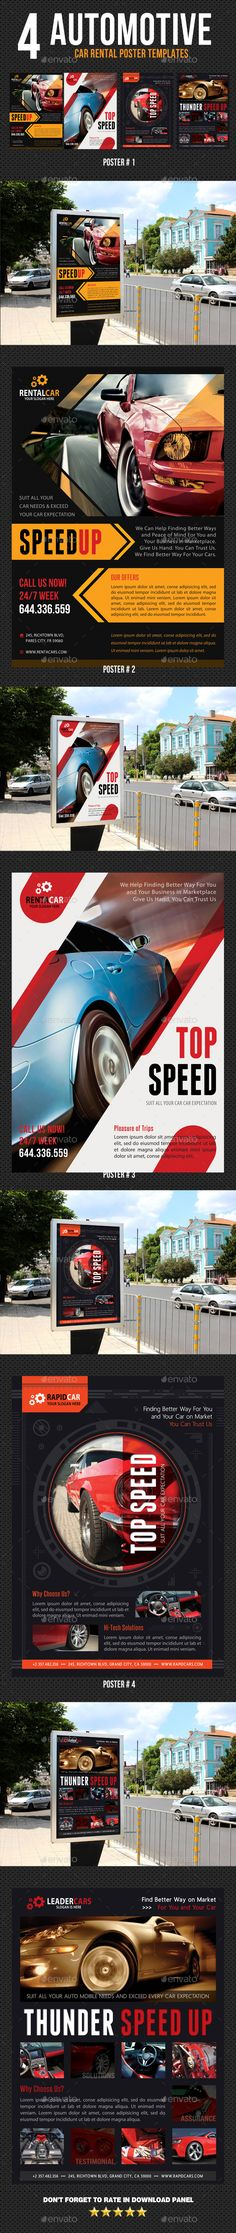 4 Automotive Car Rental Poster Template PSD Bundle. Download here: http://graphicriver.net/item/4-automotive-car-rental-poster-bundle-02/15499649?ref=ksioks